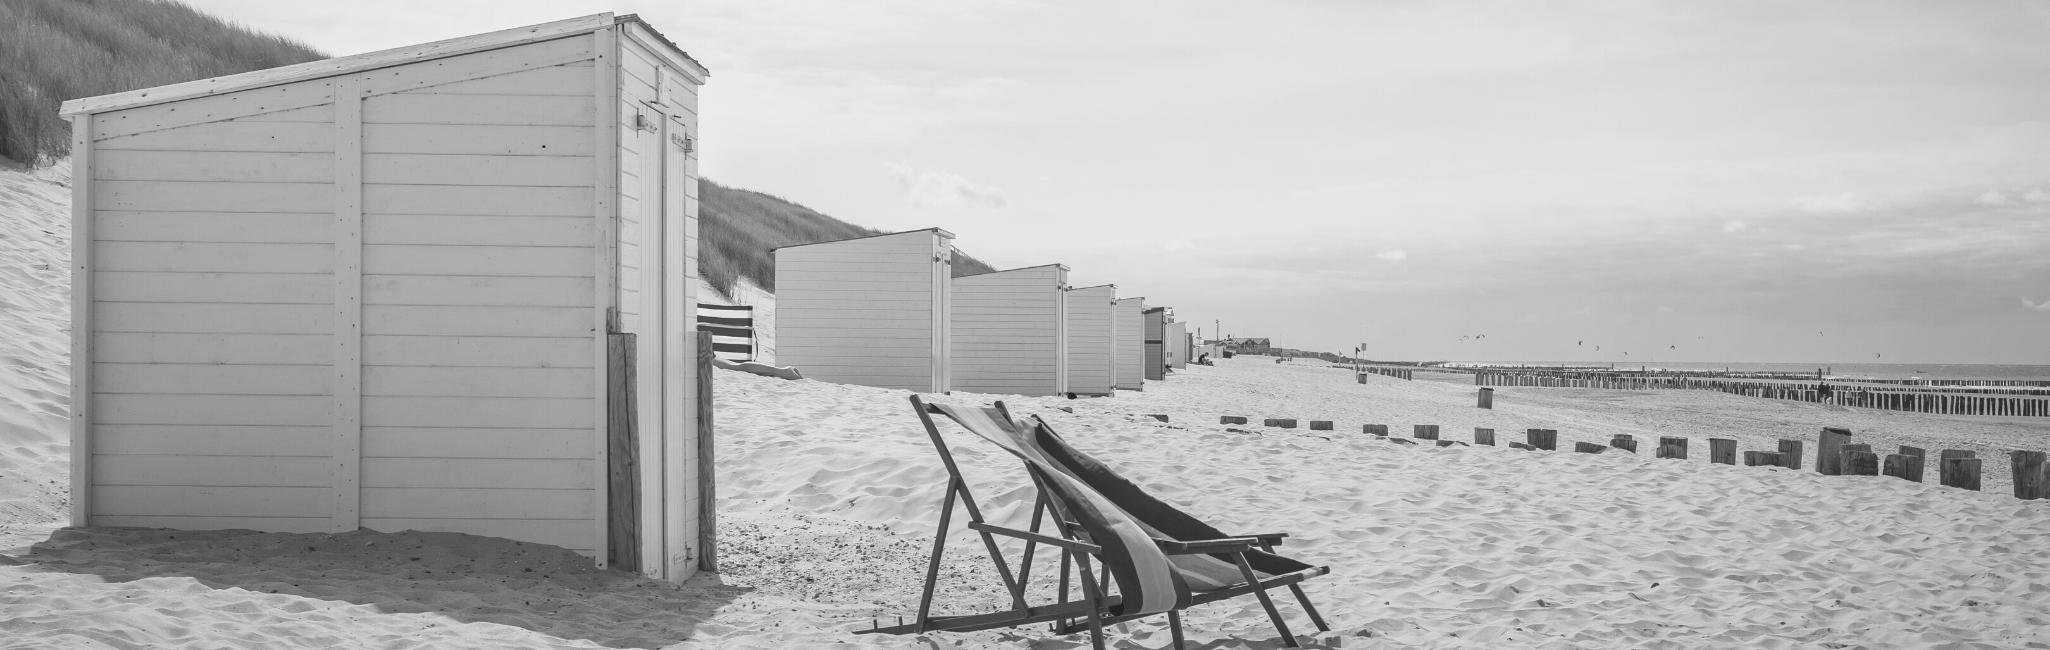 Beachhouse with chair